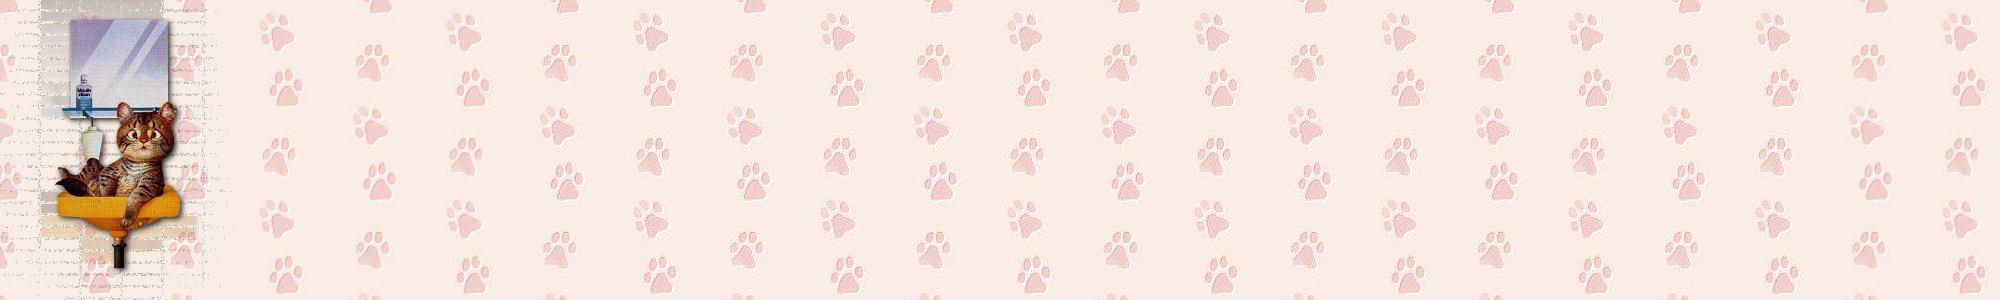 Fondo IM gatos_020.imf